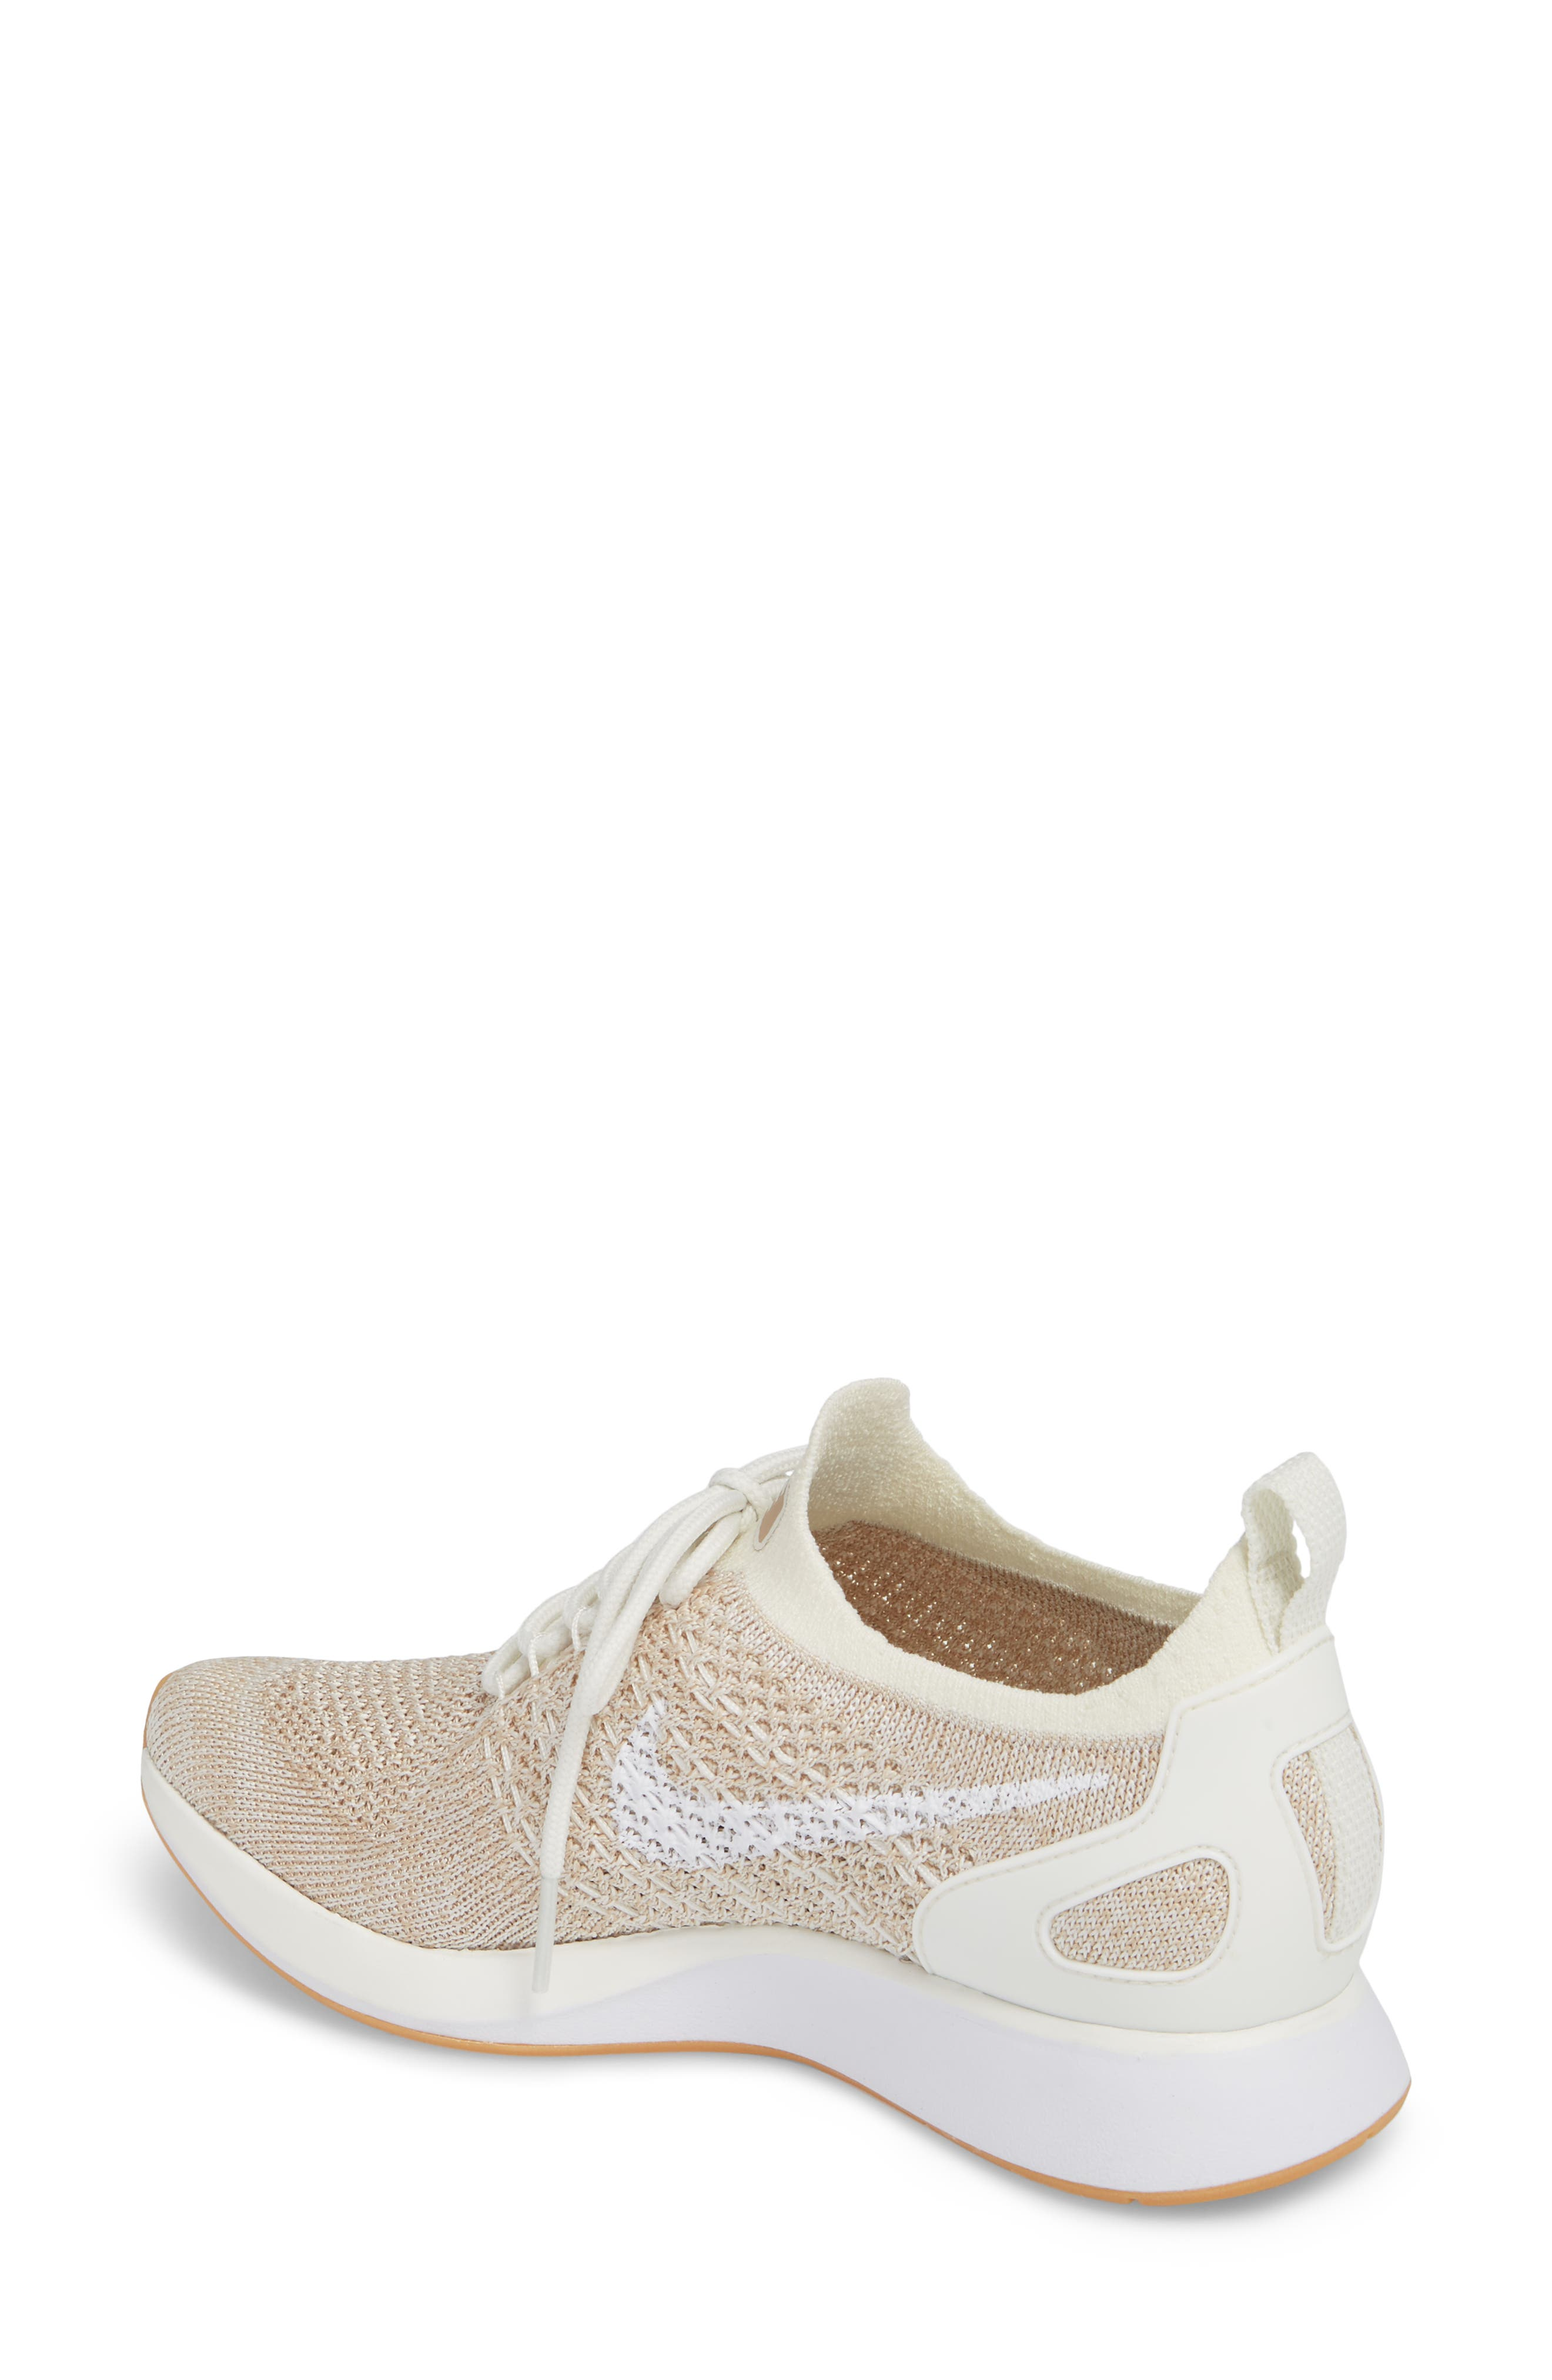 Air Zoom Mariah Flyknit Racer Sneaker,                             Alternate thumbnail 2, color,                             Sail/ White/ Sand